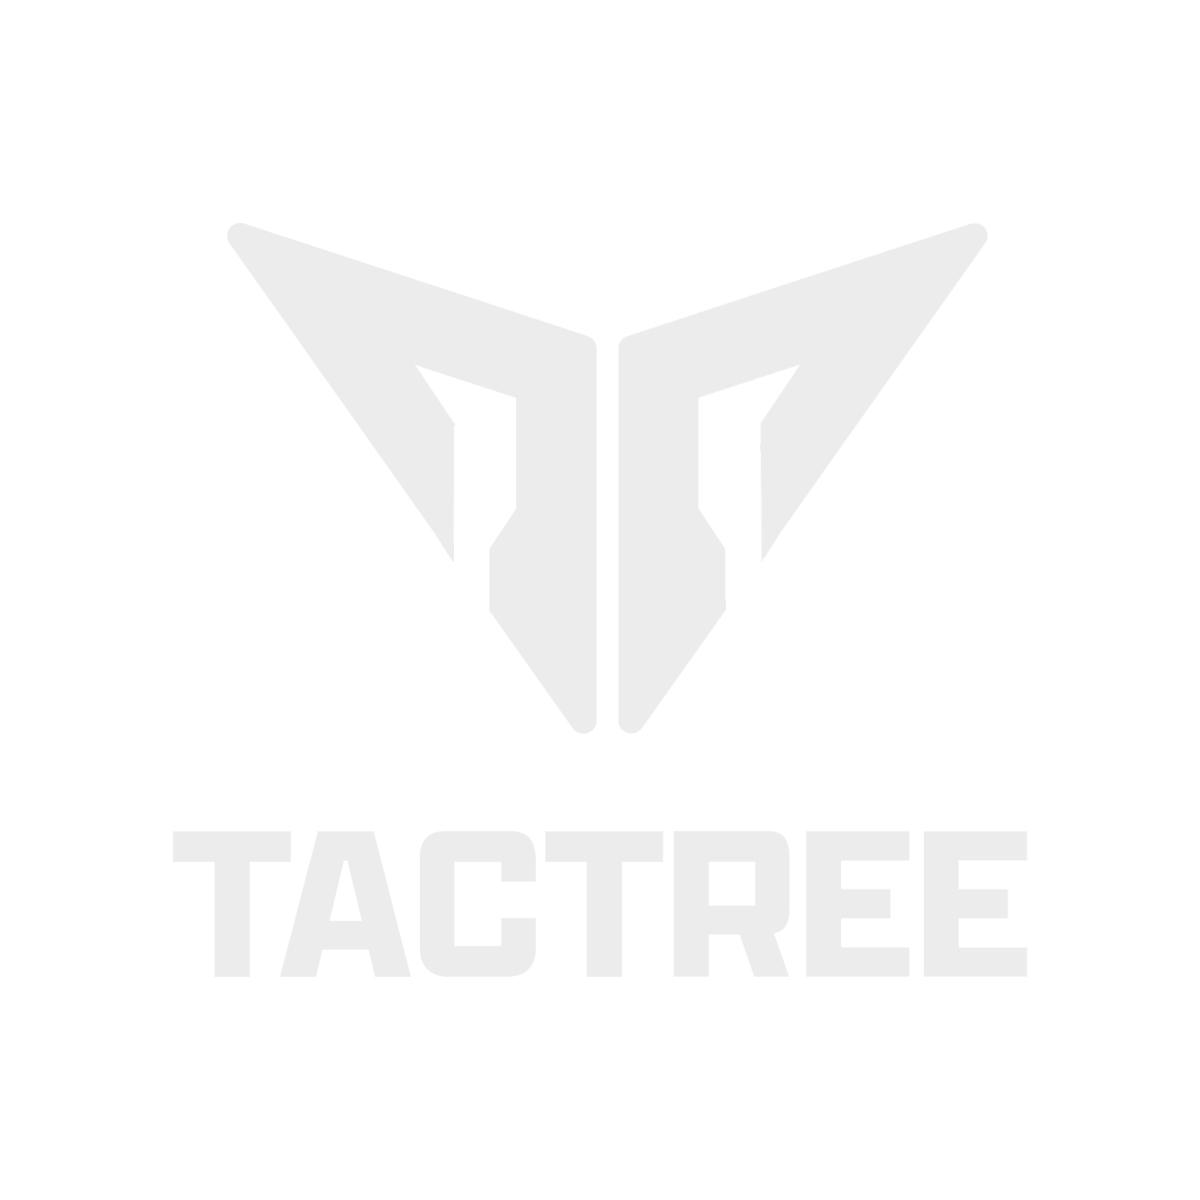 5.11 GEO7 Fast-Tac TDU Long Sleeve Shirt (Terrain)